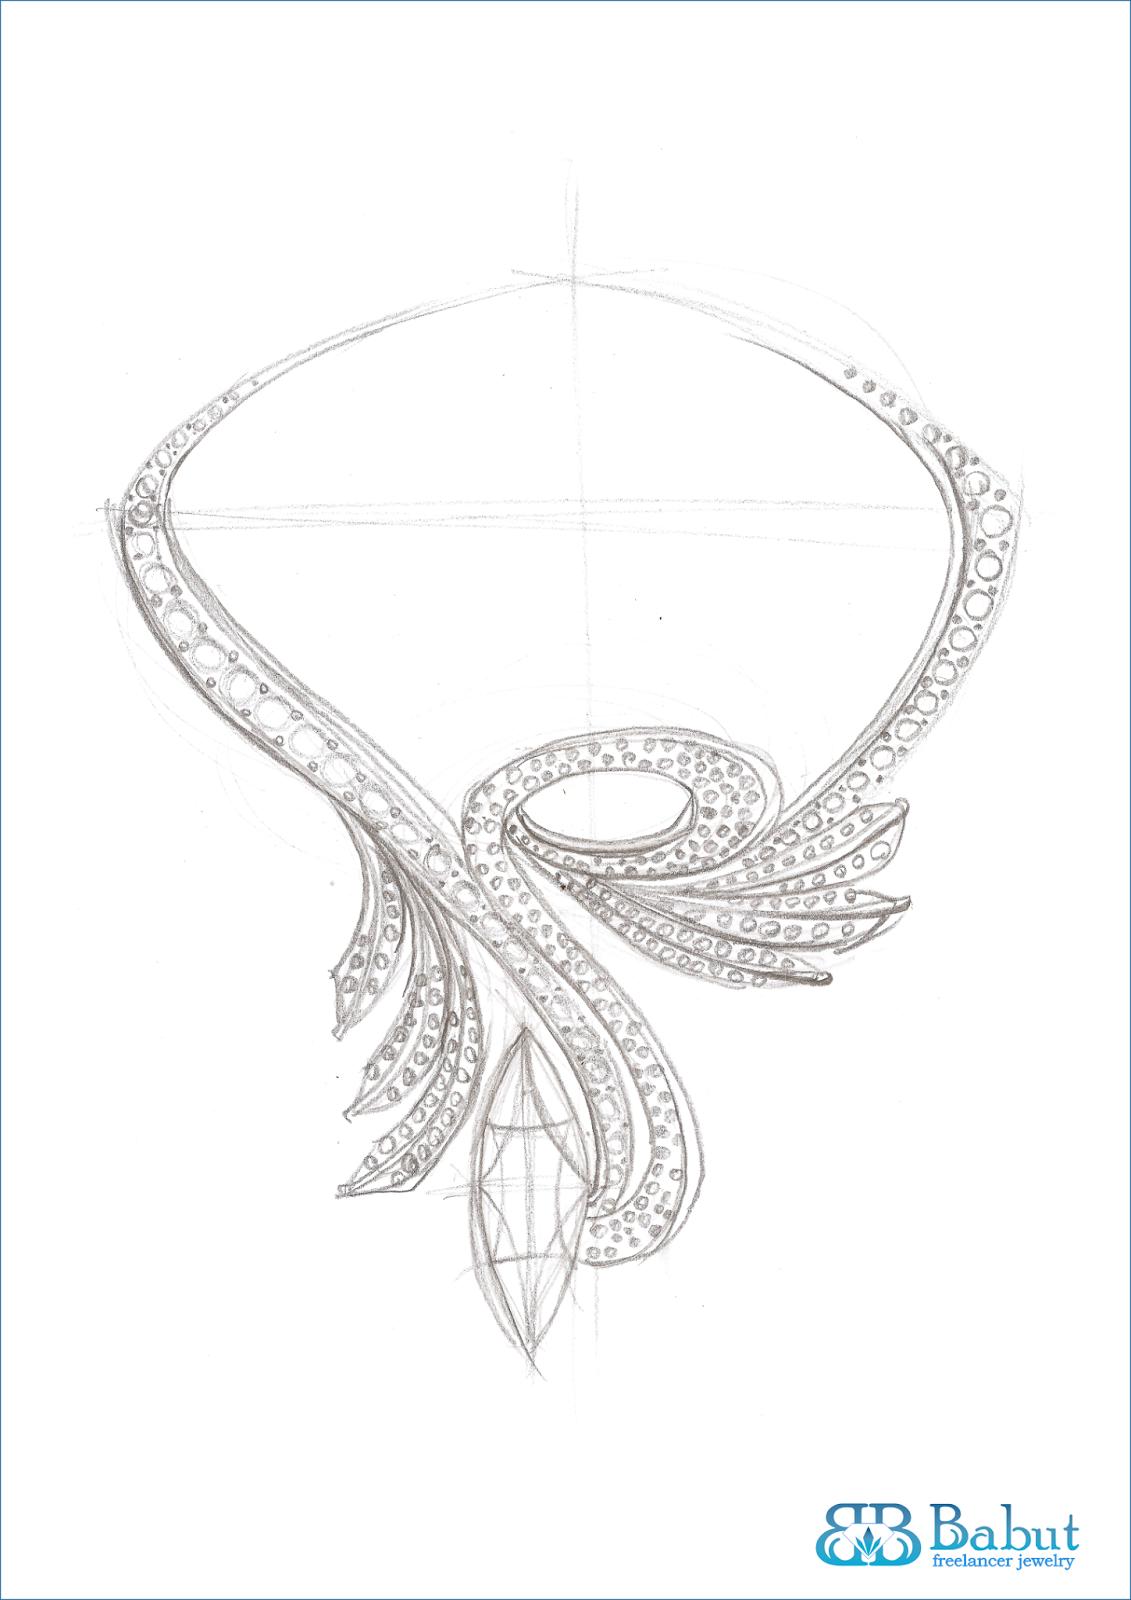 sketches design jewelry - Babut Florin Valentin | เครื่องประดับ ...